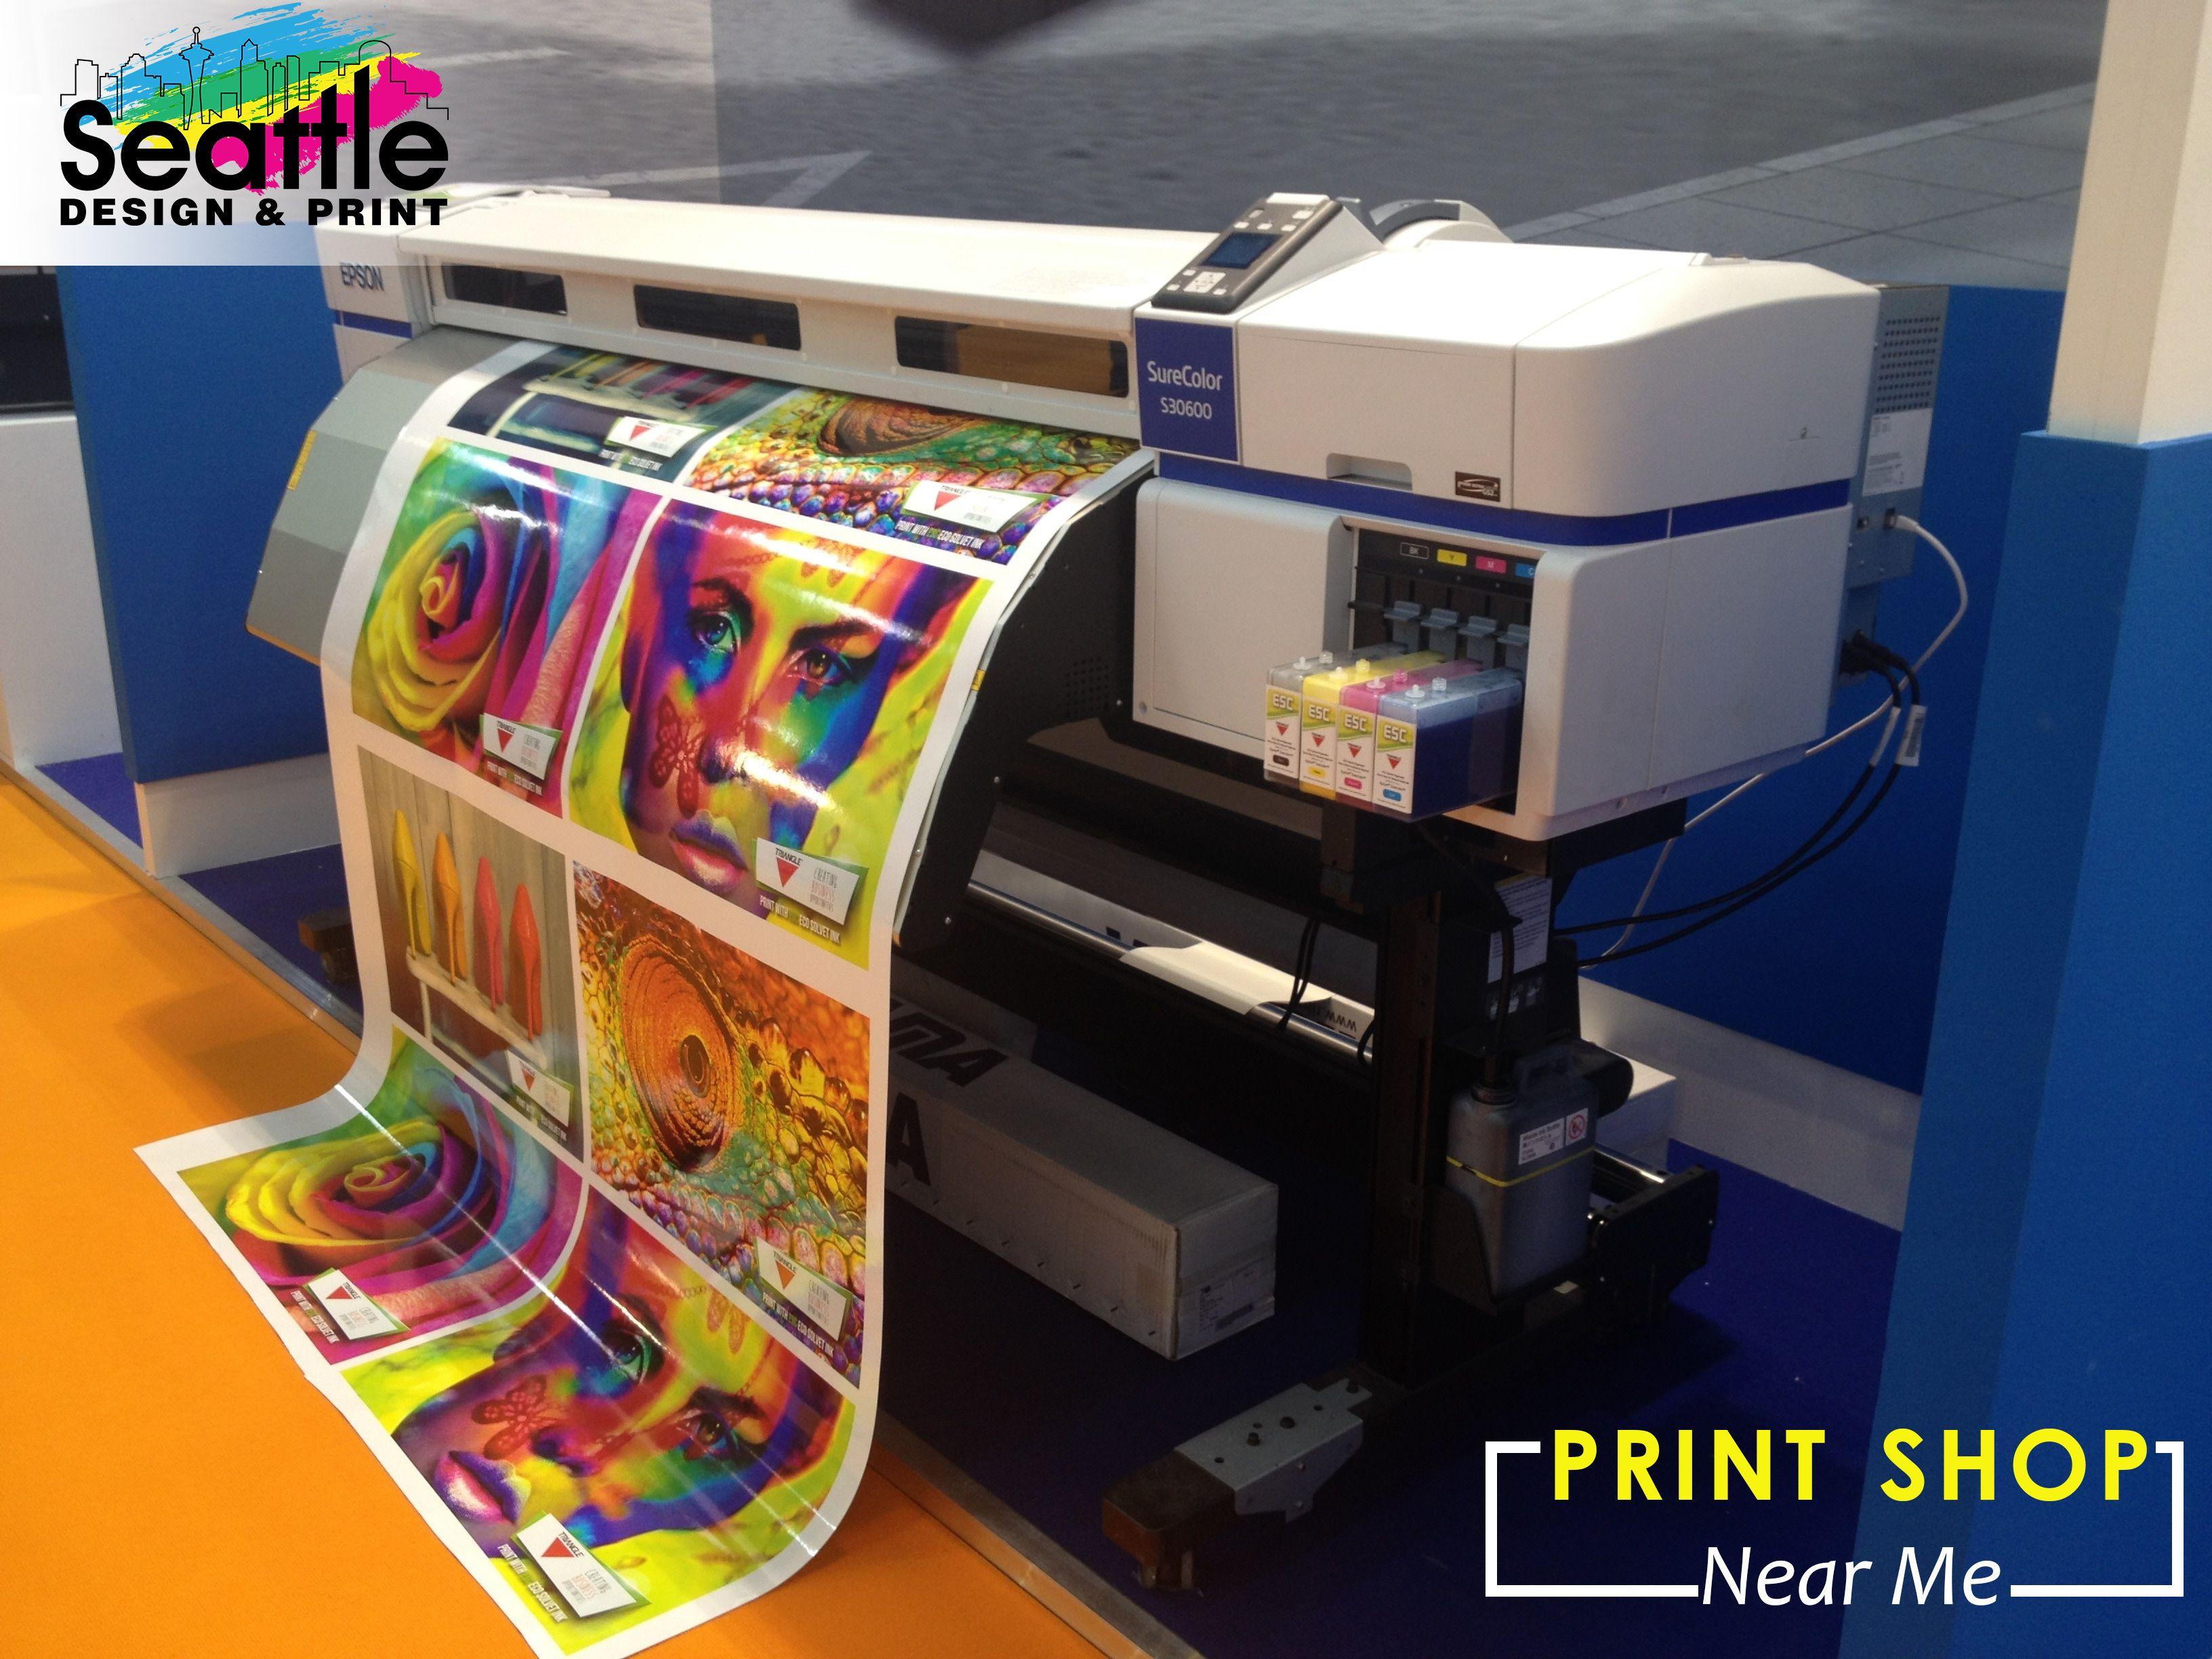 Best Print Shop Near Me Digital Printing Services Cheap Printing Services Printing Business